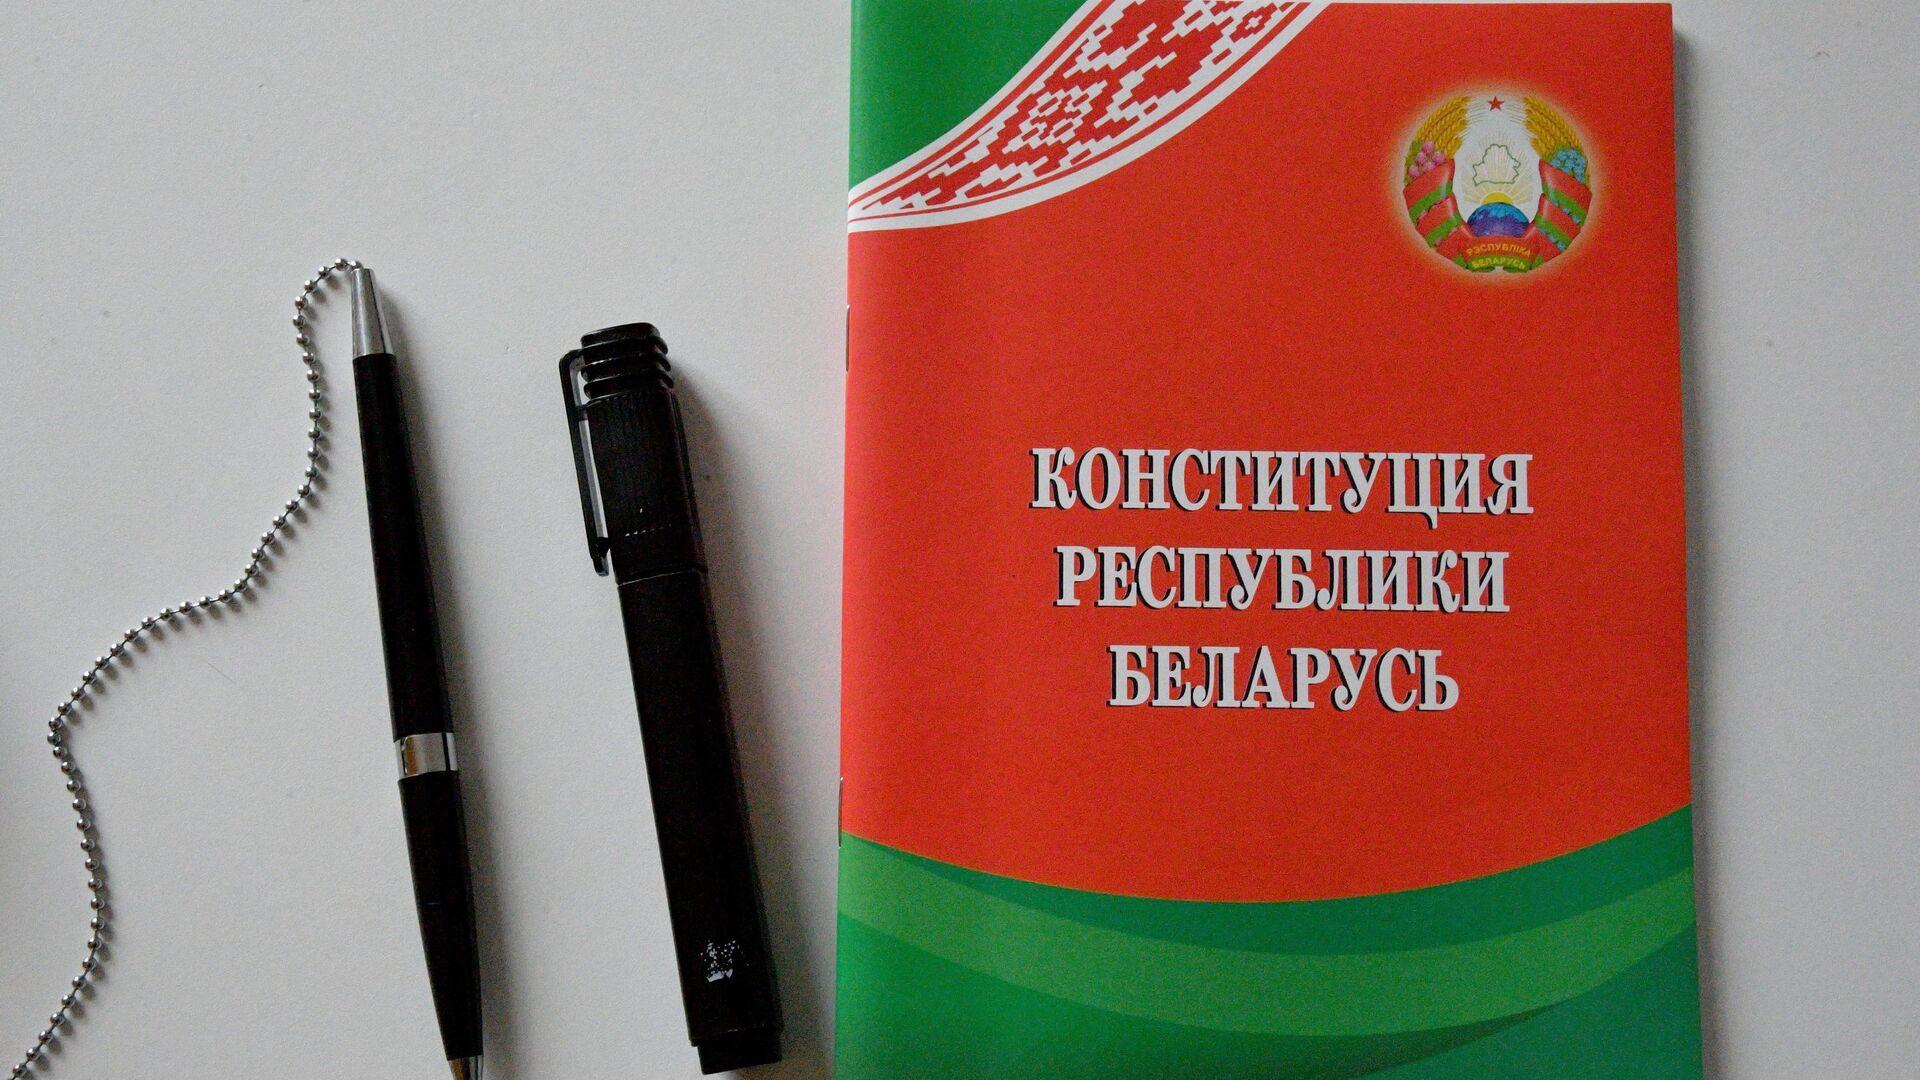 Конституция Республики Беларусь - Sputnik Беларусь, 1920, 02.10.2021